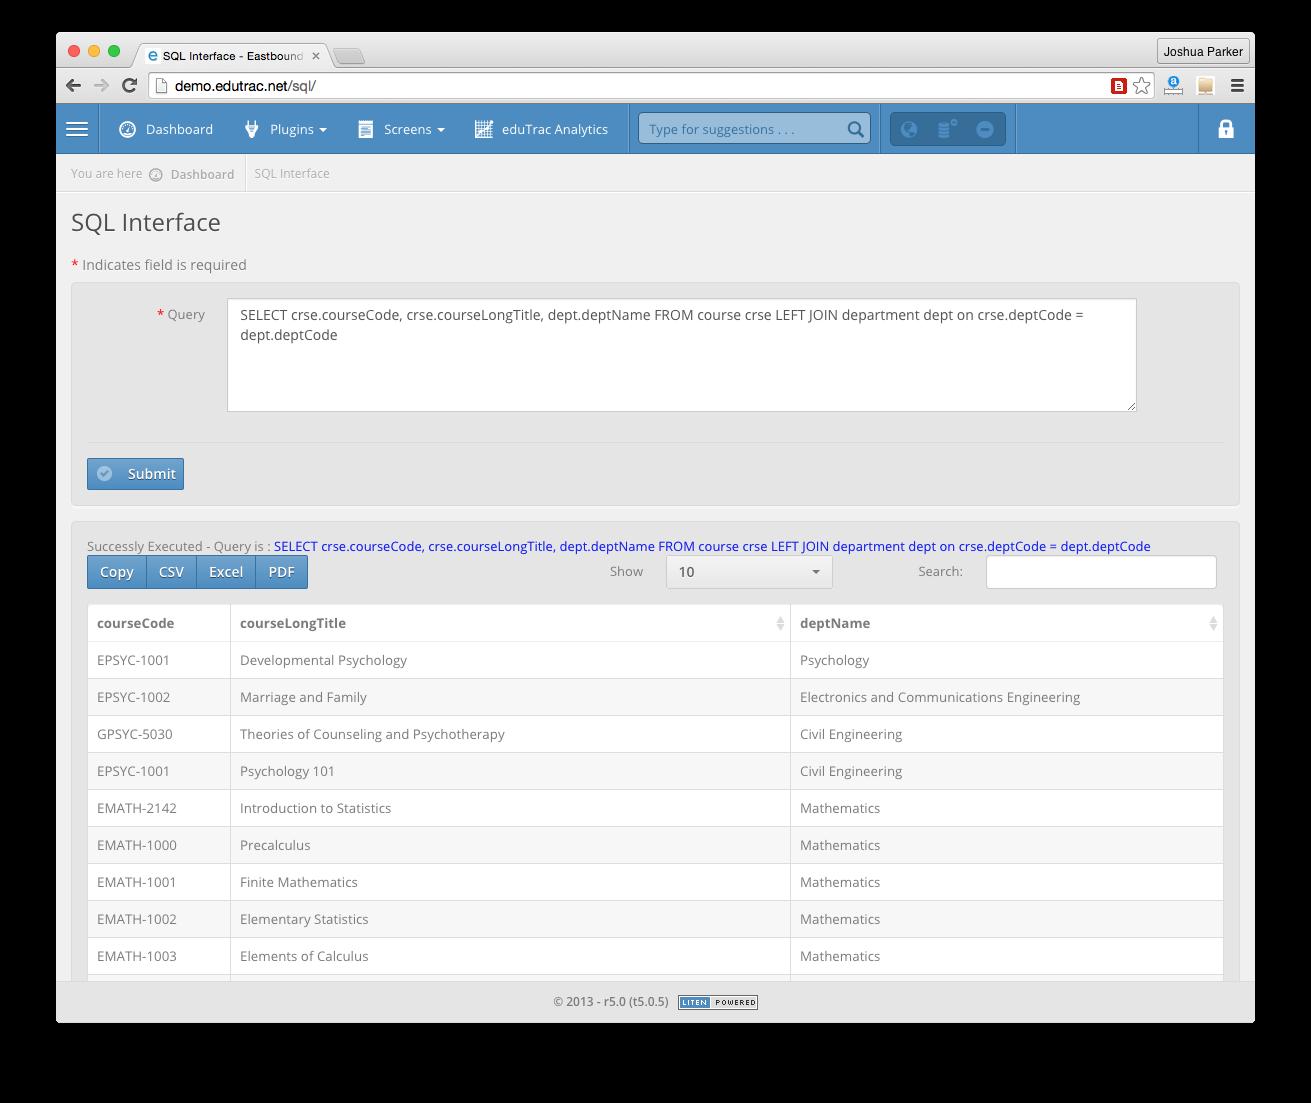 edutrac student information system download sourceforge net